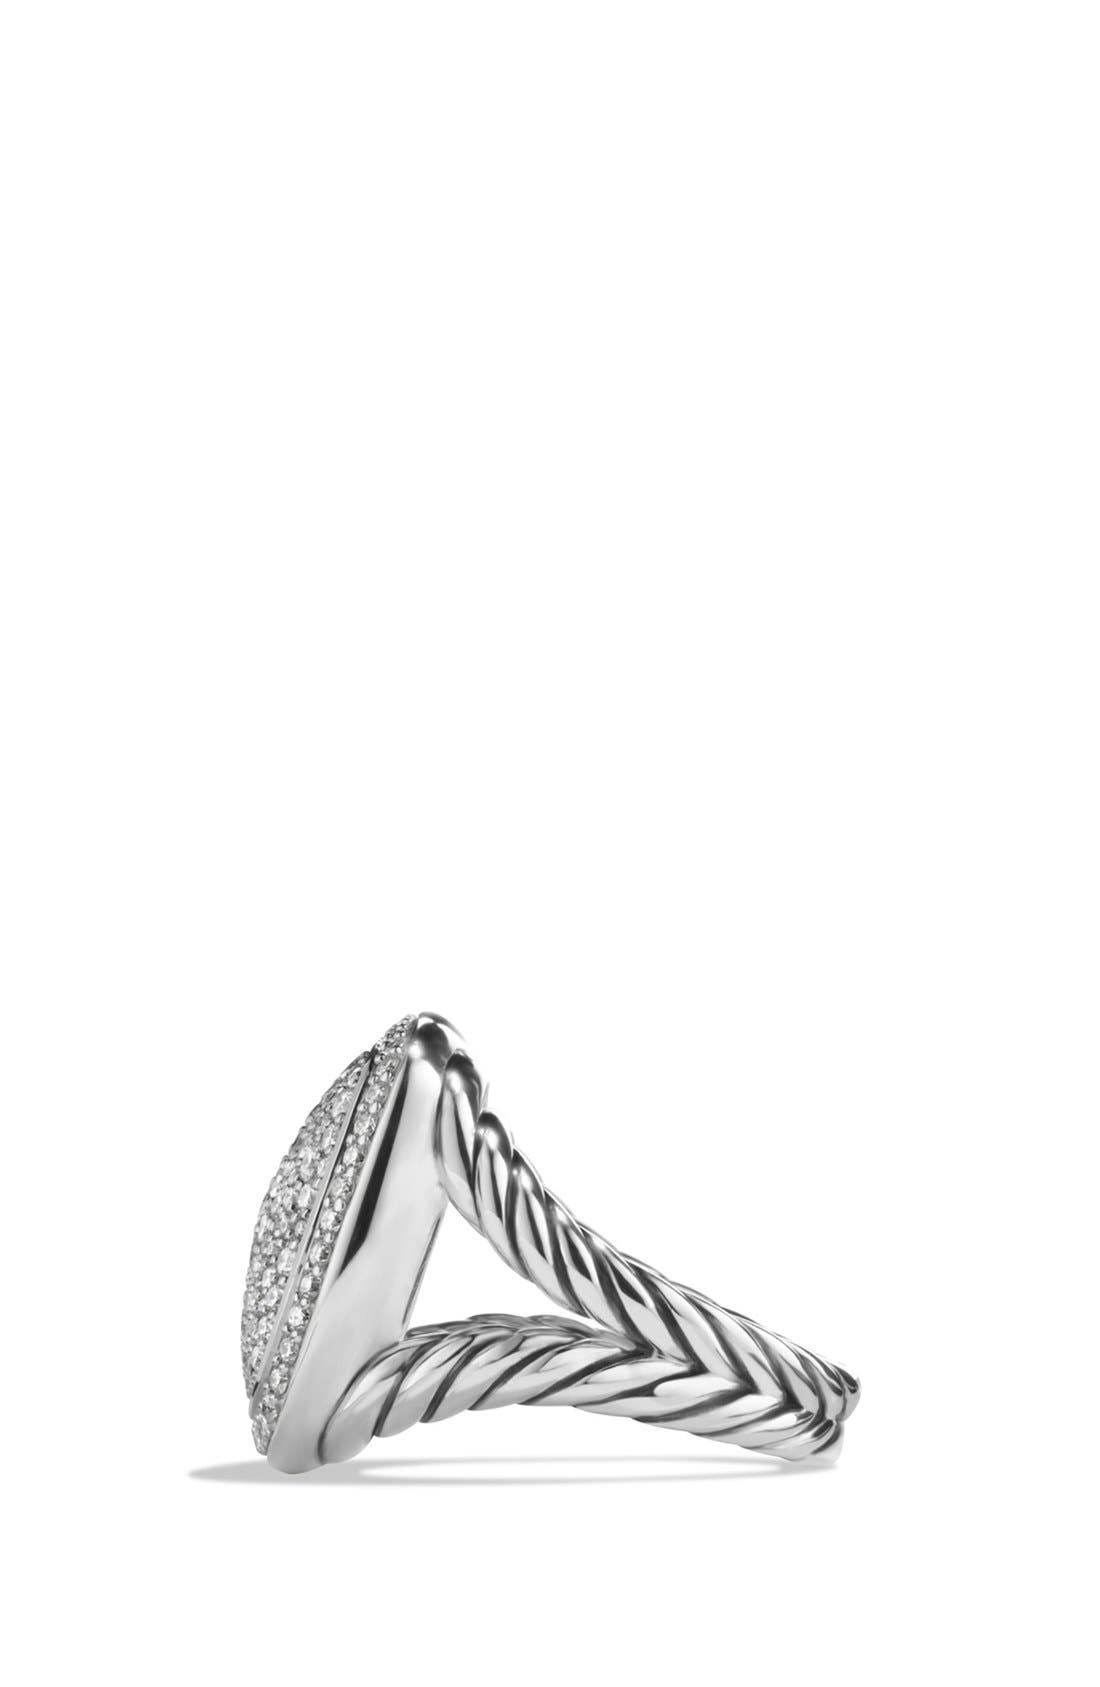 Albion Ring with Diamonds,                             Alternate thumbnail 3, color,                             DIAMOND